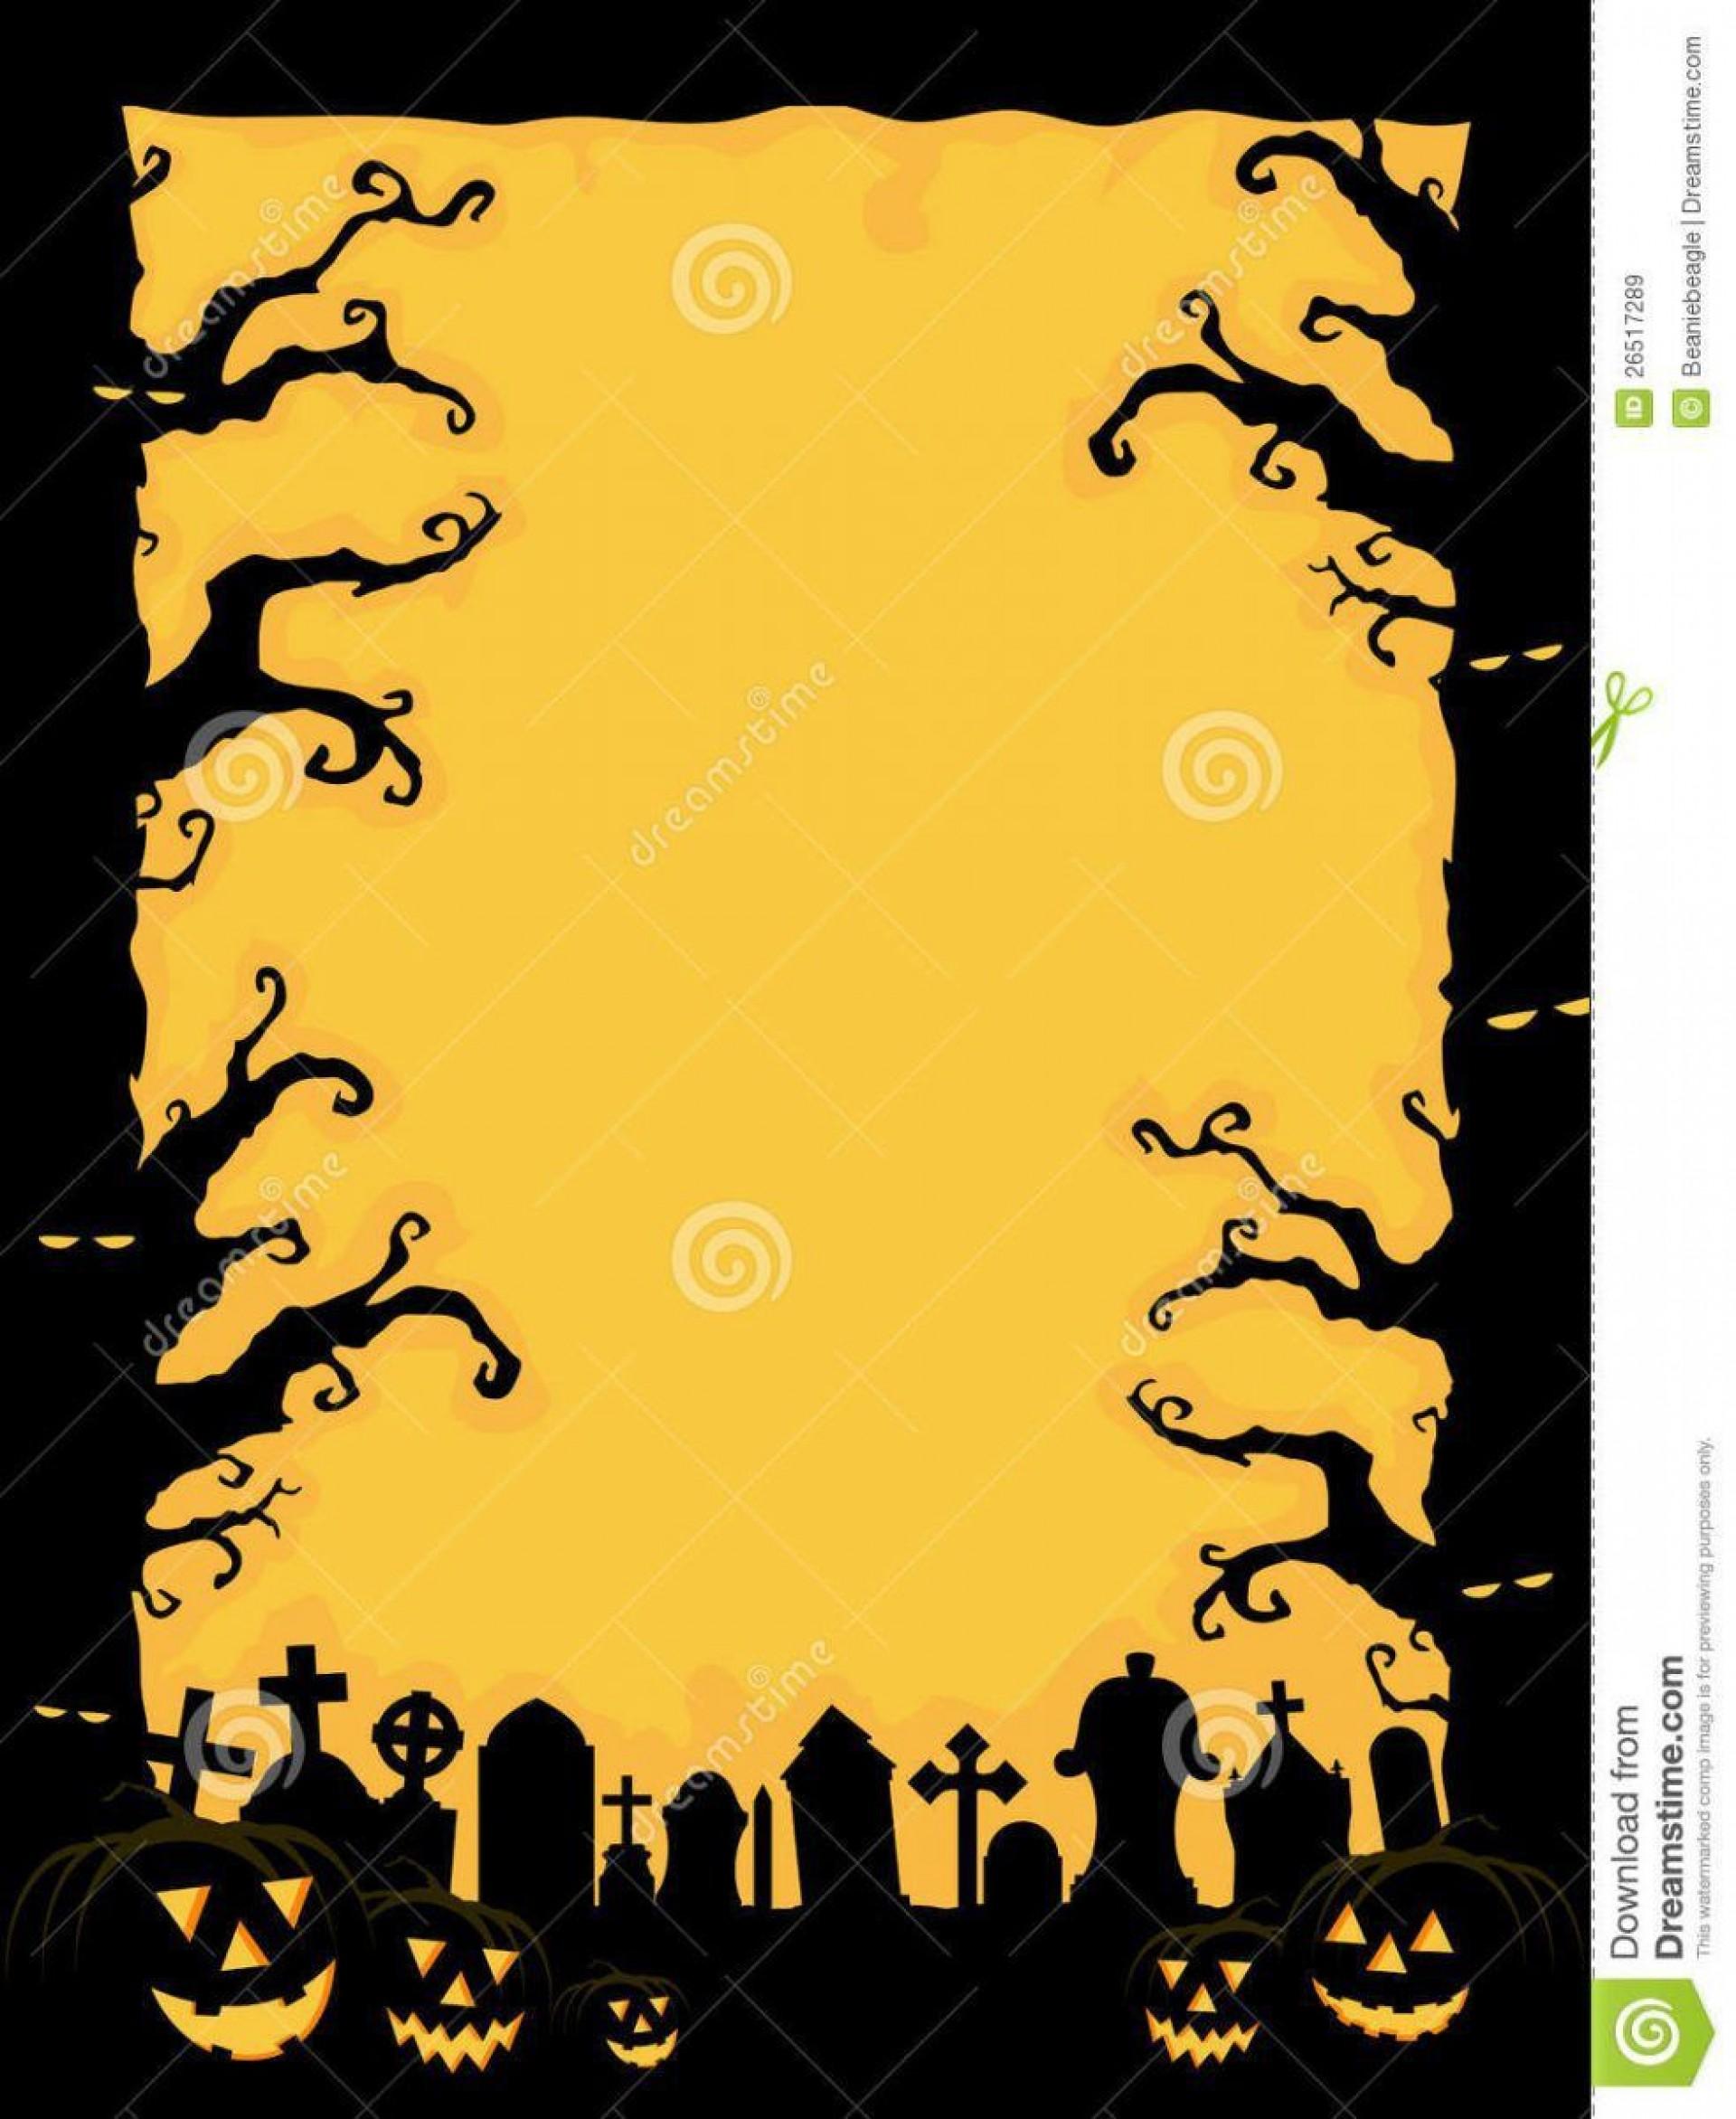 005 Stirring Free Halloween Invitation Template Idea  Templates Online Printable Birthday Party Wedding1920